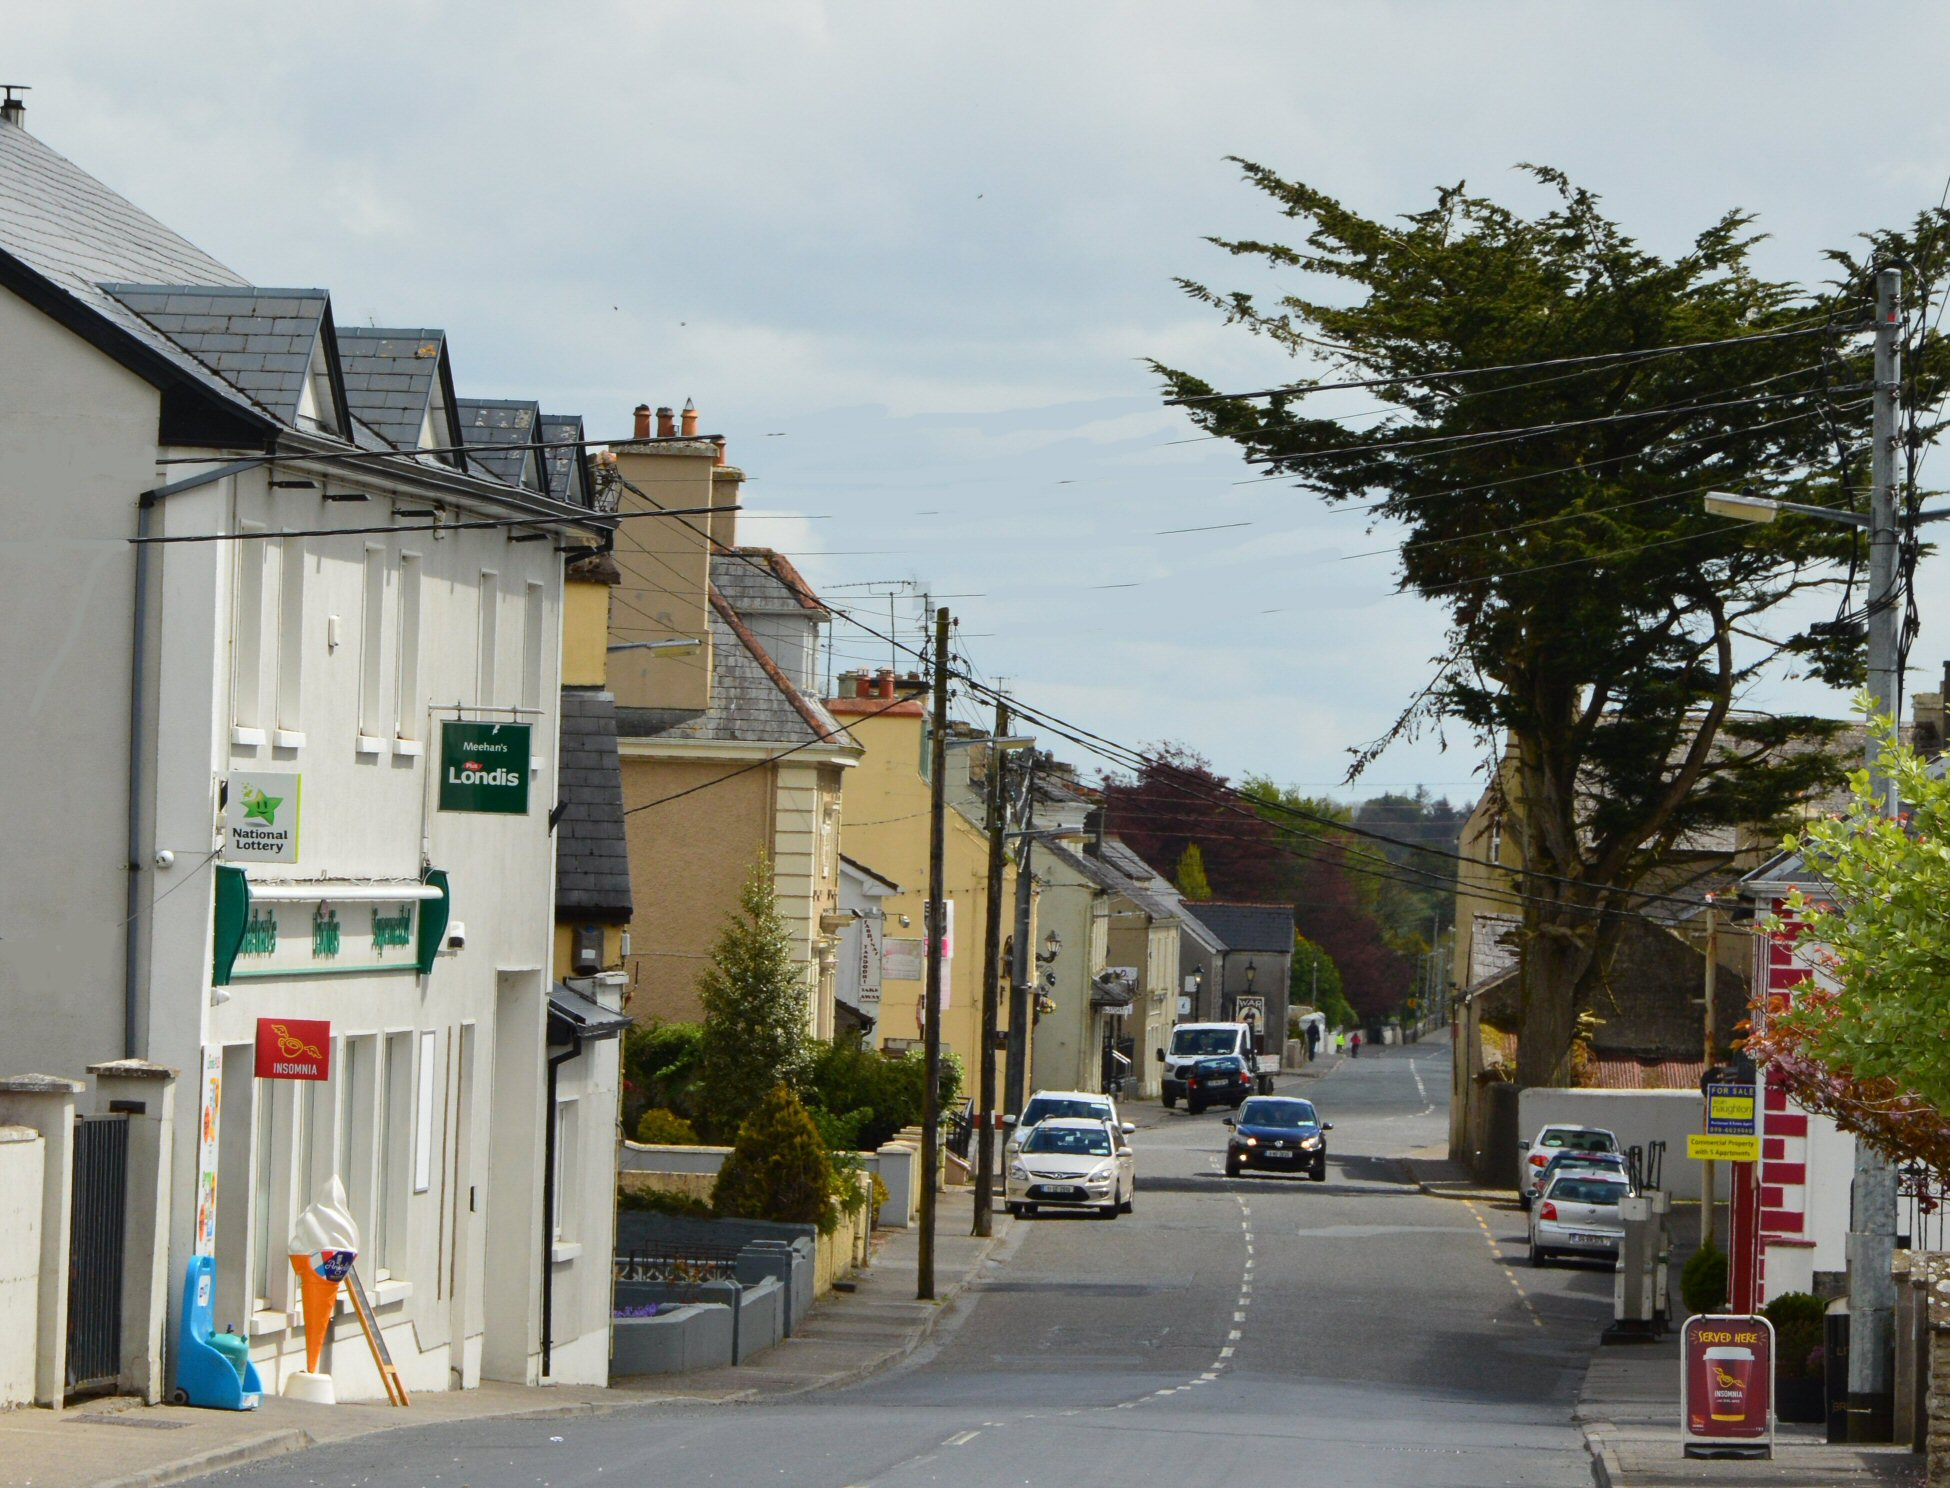 Church Street, looking eastward